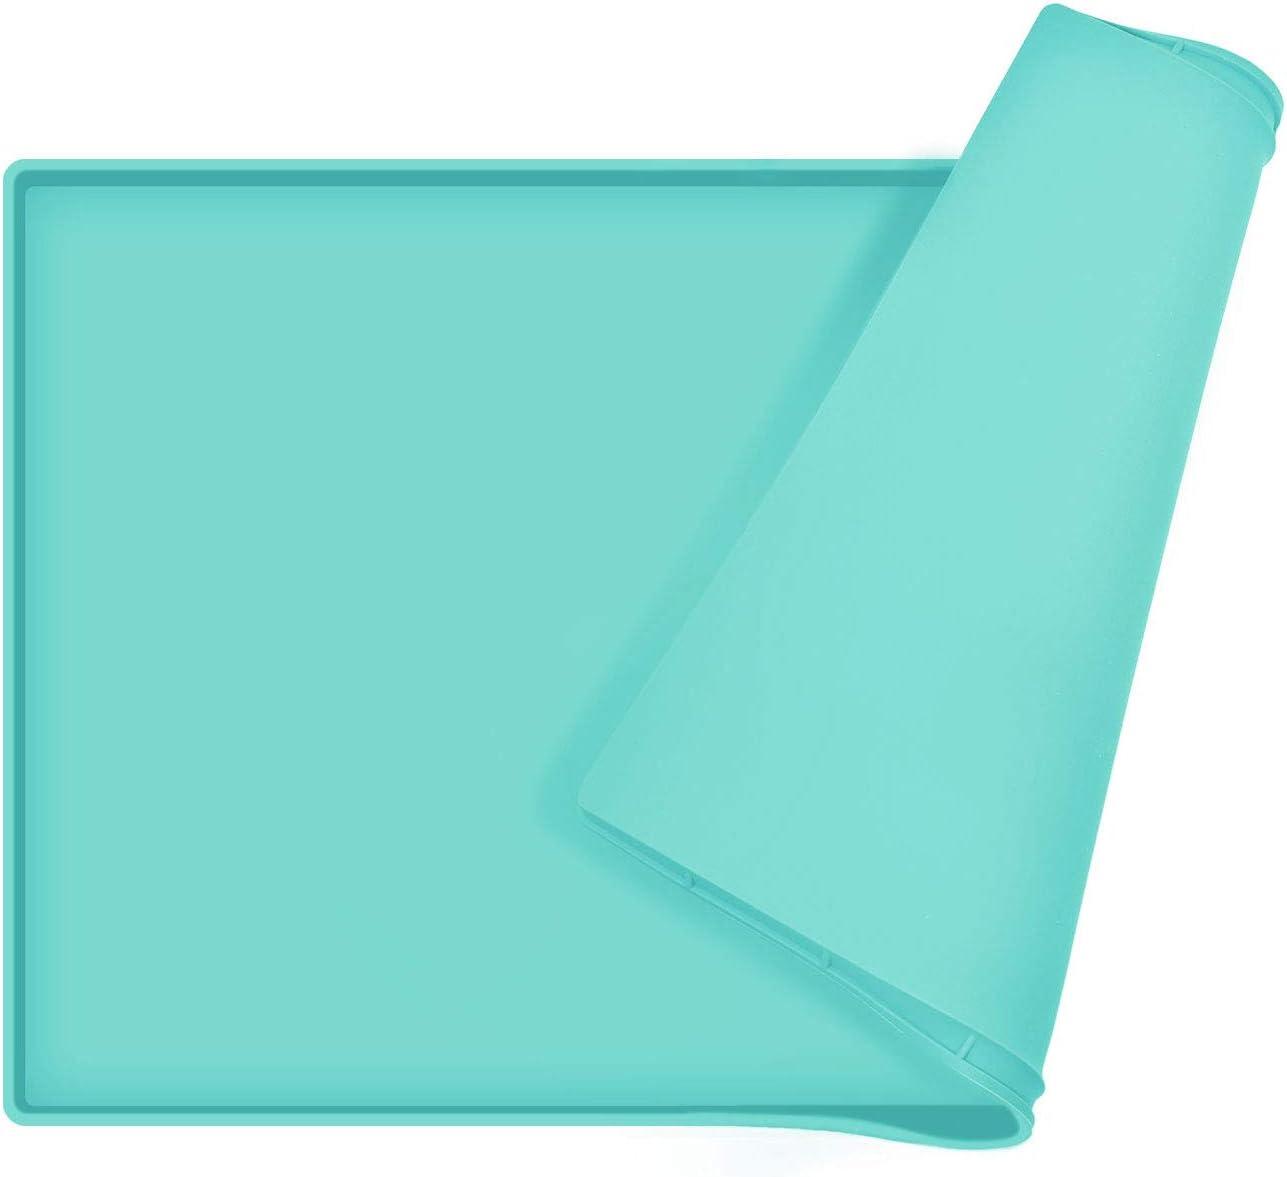 EIOKIT Dog Food Mat, Silicone Waterproof Dog Cat Food Tray,Non Slip Pet Bowl Mats Placemat, Size: M(18.5